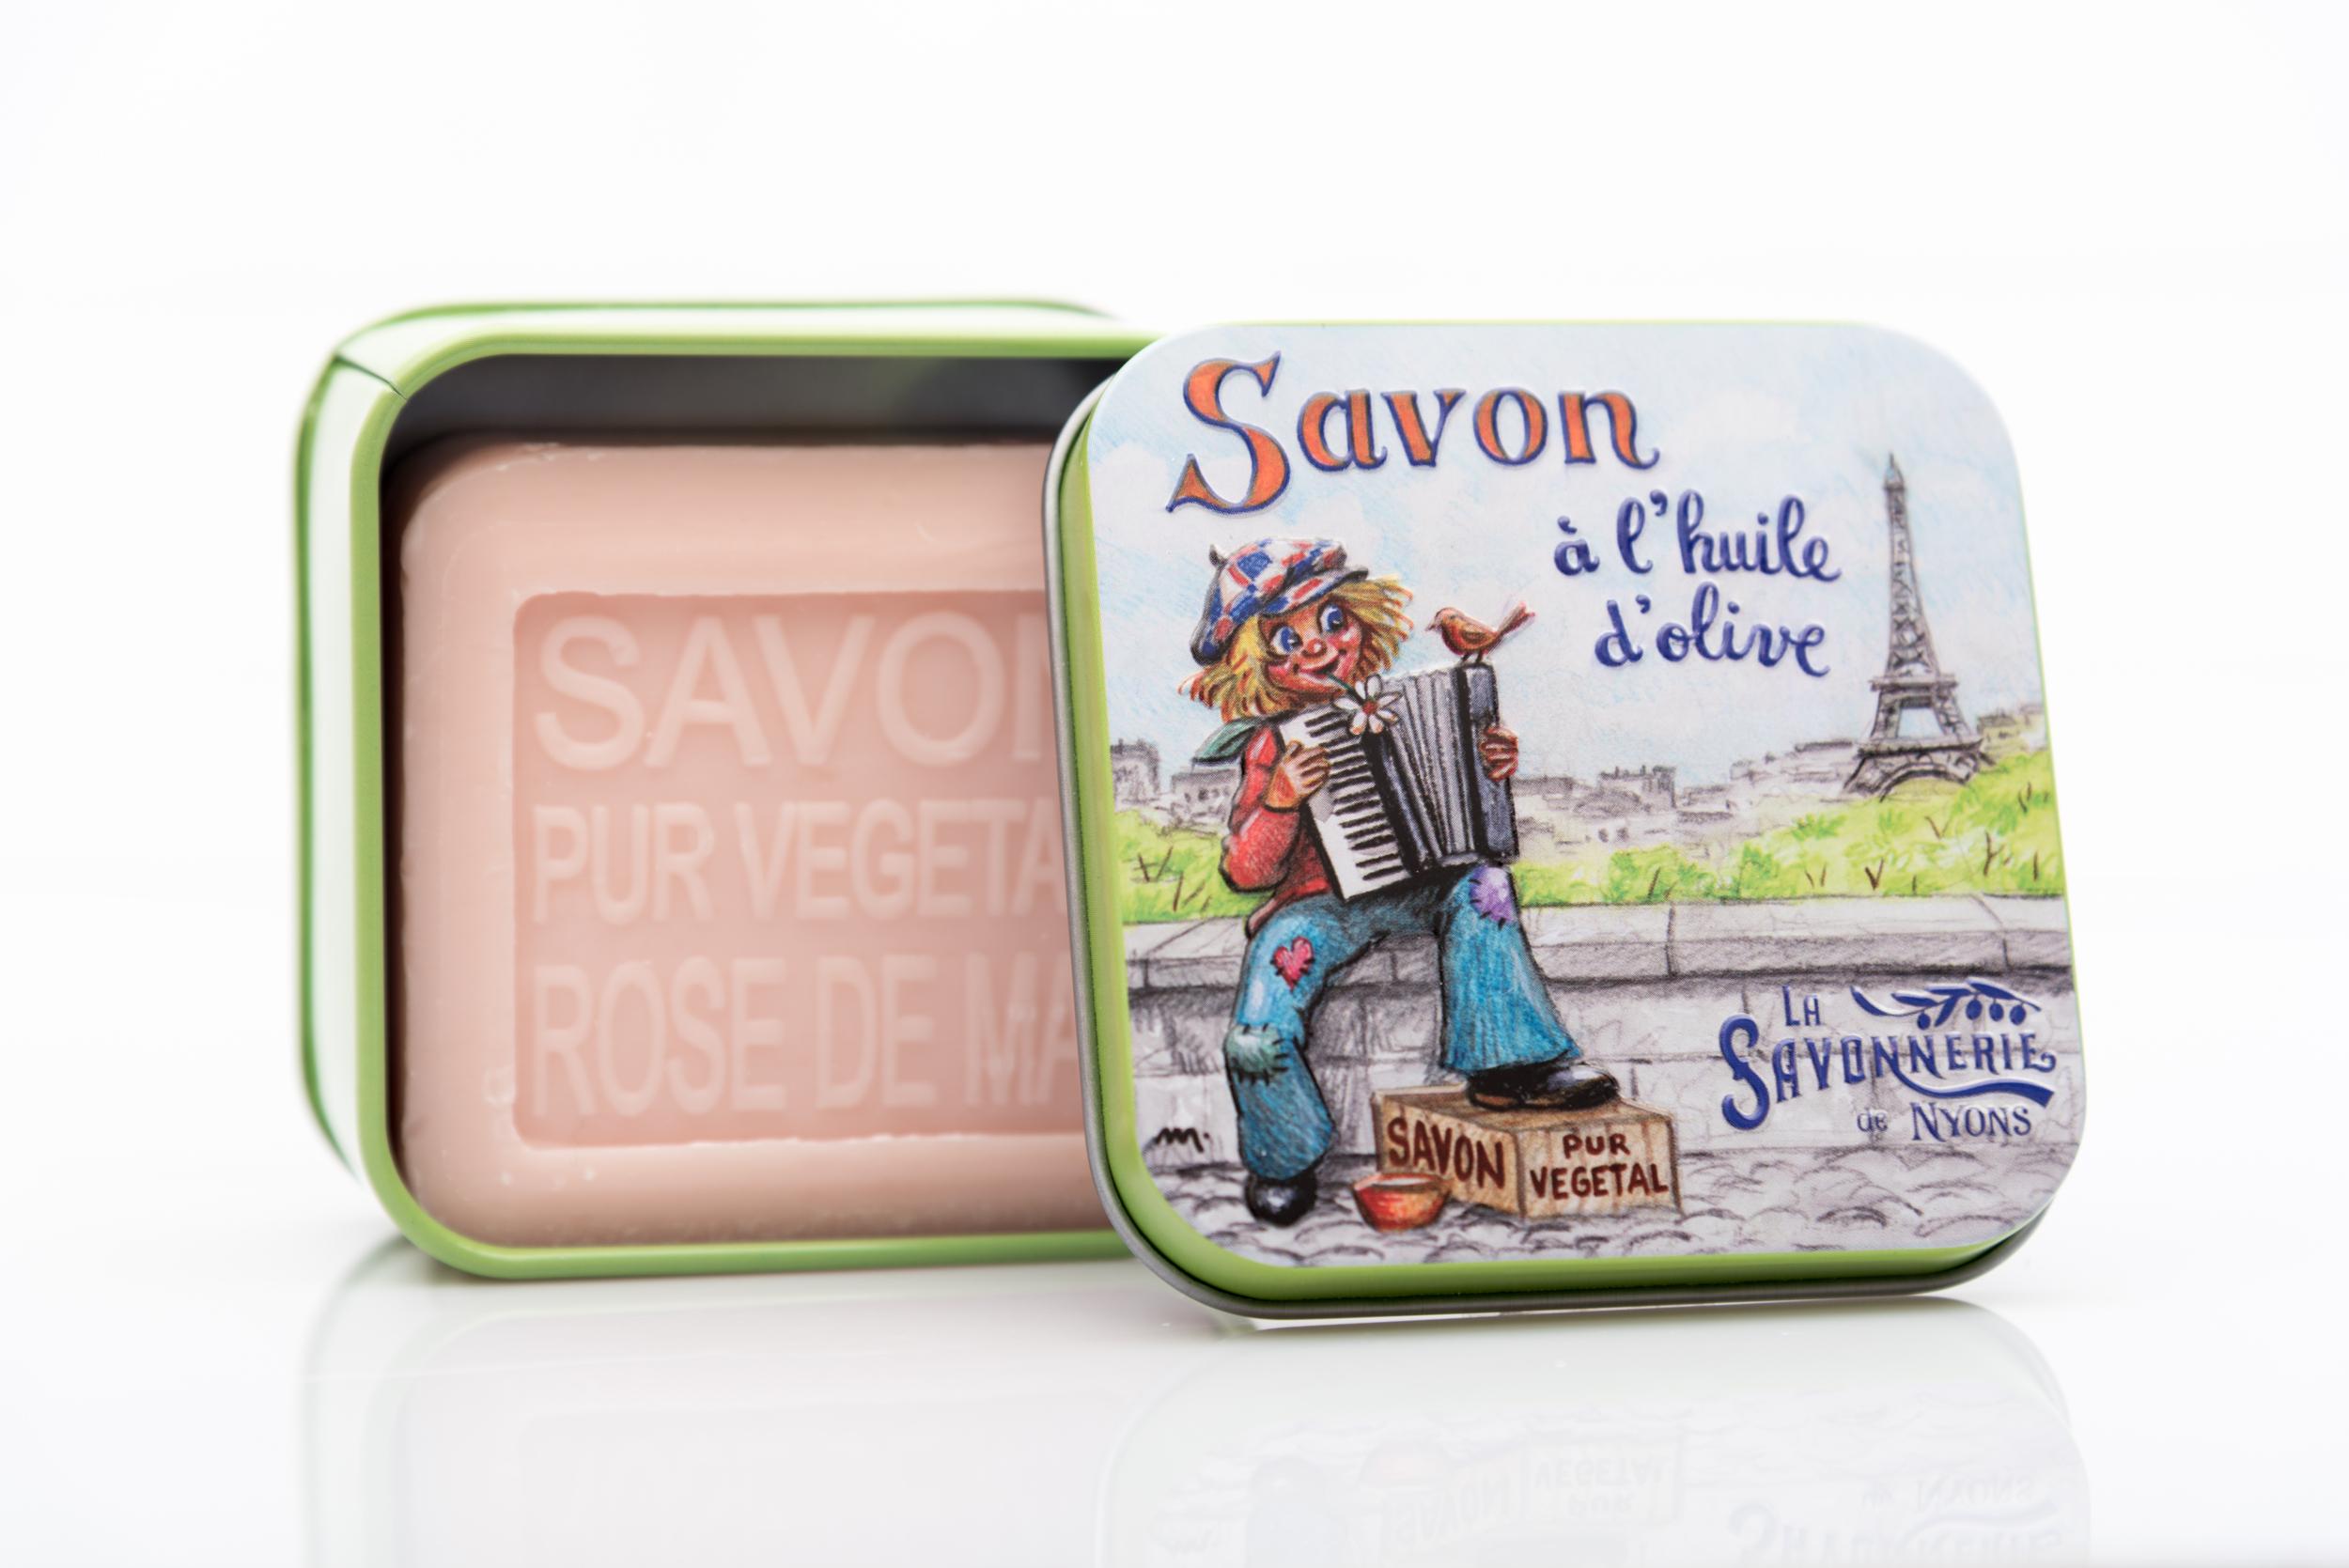 SAVON DE NYONS VEGETAL MADE IN FRANCE AVEC BOITE METALIQUE MODELE 46 A LA ROSE DE MAI